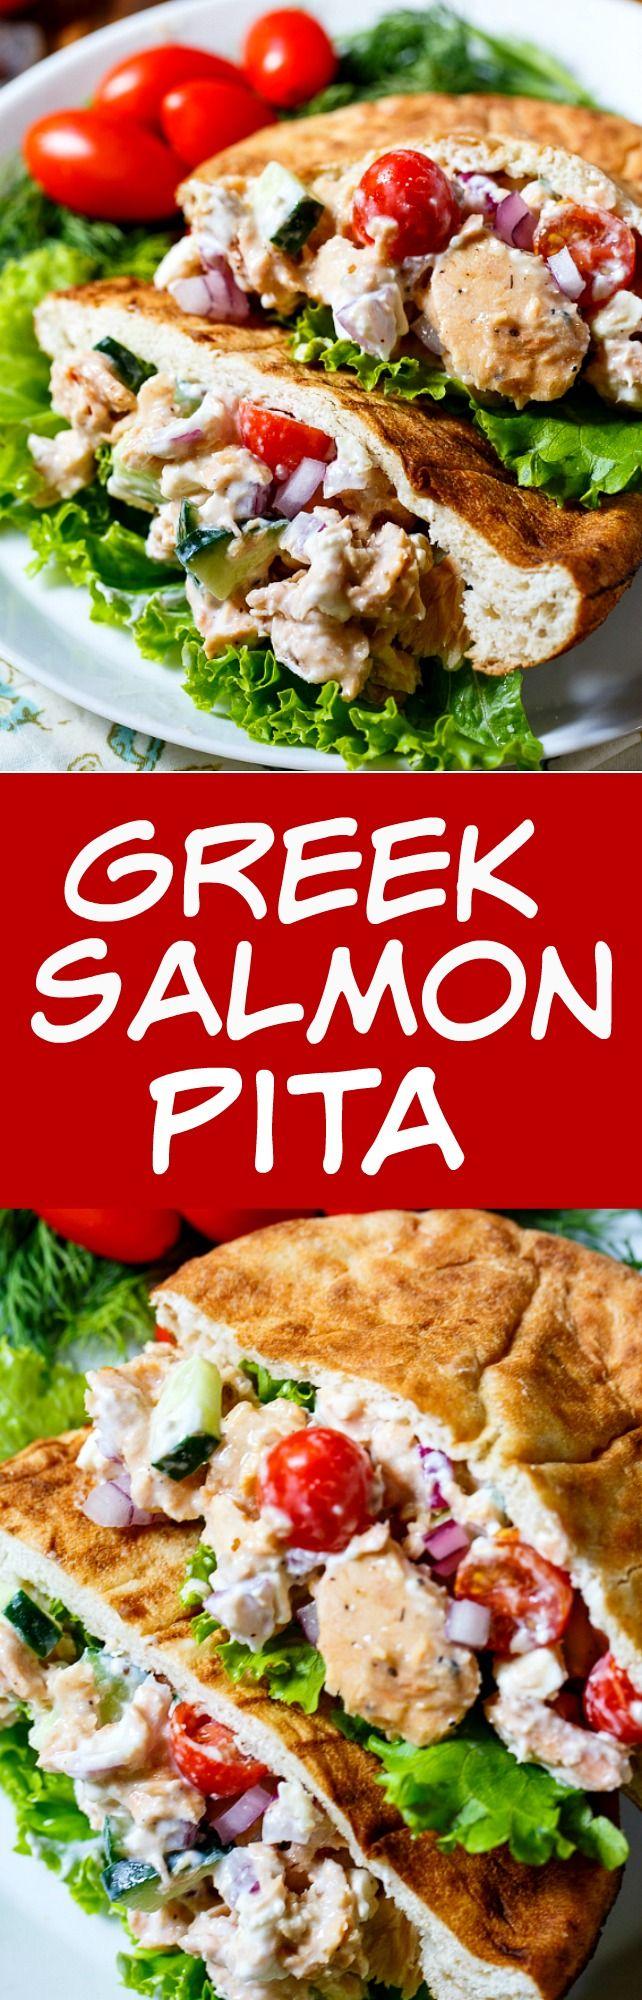 Greek Salmon Pita Sandwich with feta cheese, Greek yogurt, cucumbers, and tomatoes.